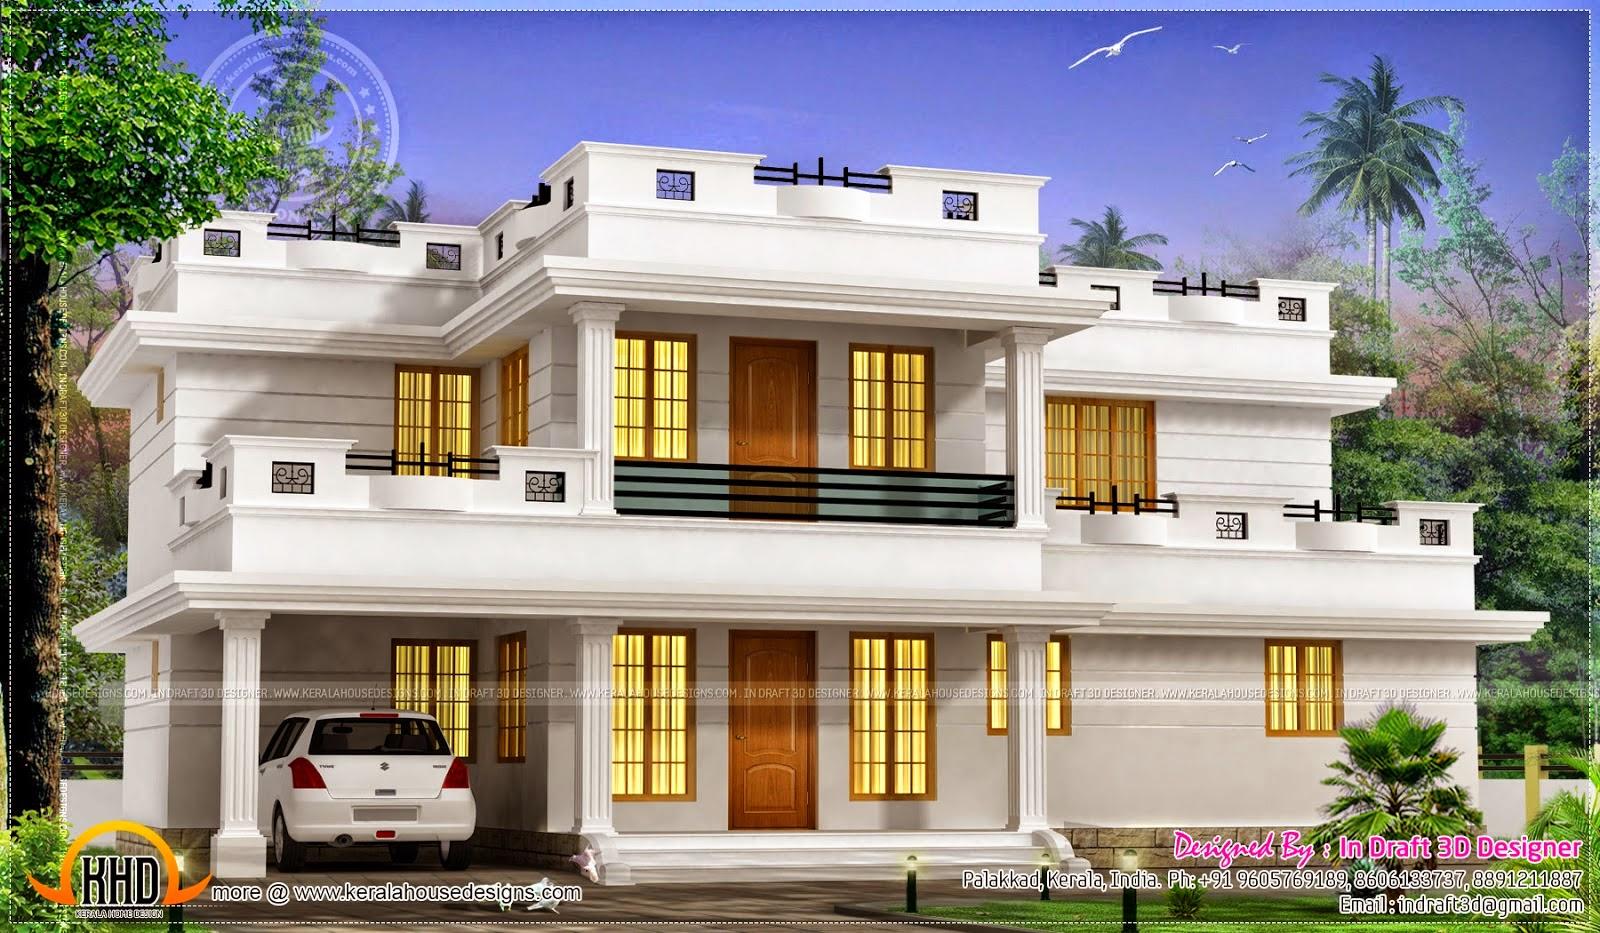 Desain Rumah Minimalis Atap Datar Kumpulan Desain Rumah